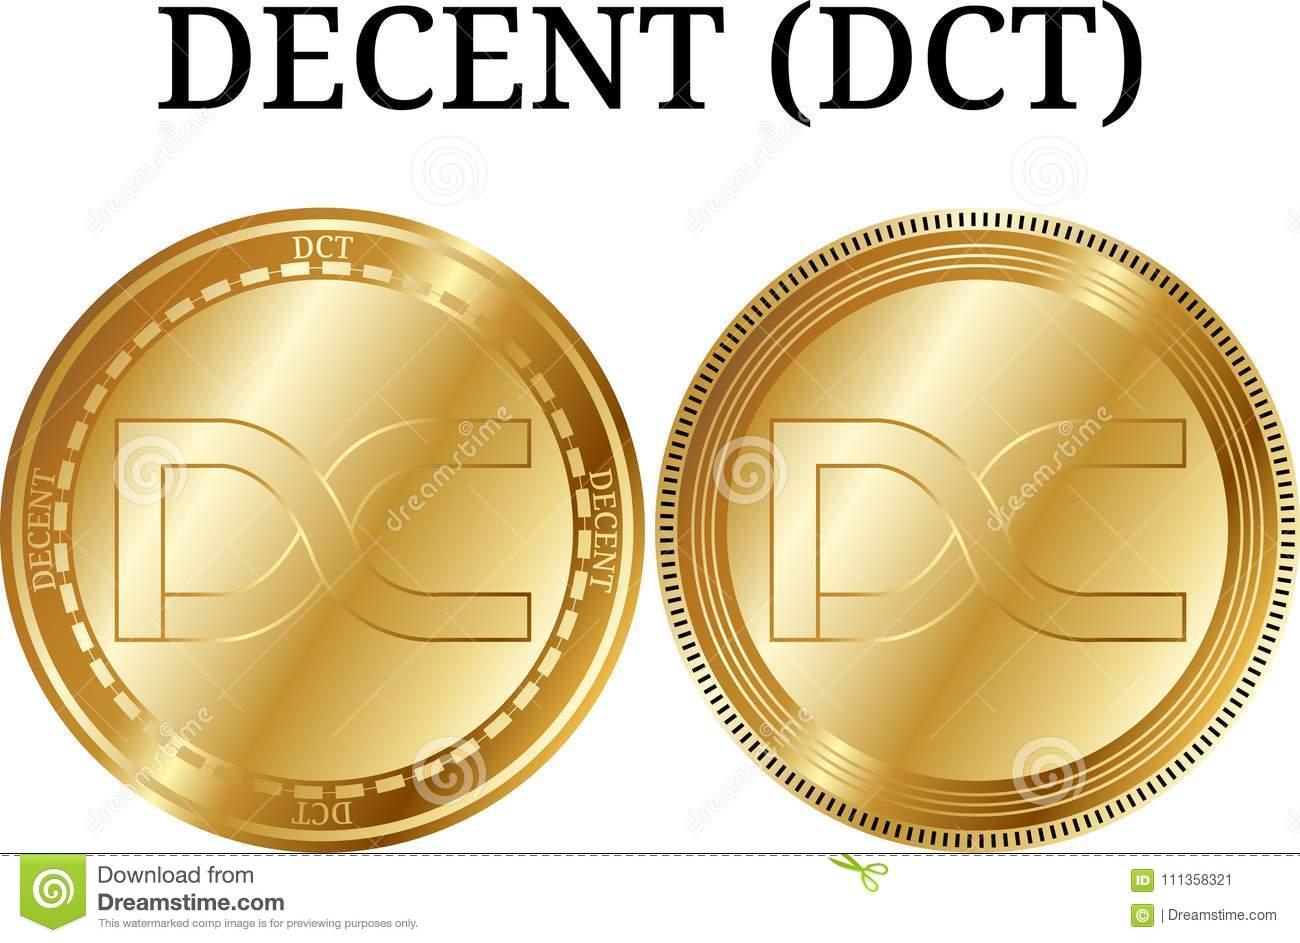 کیف پول Decent